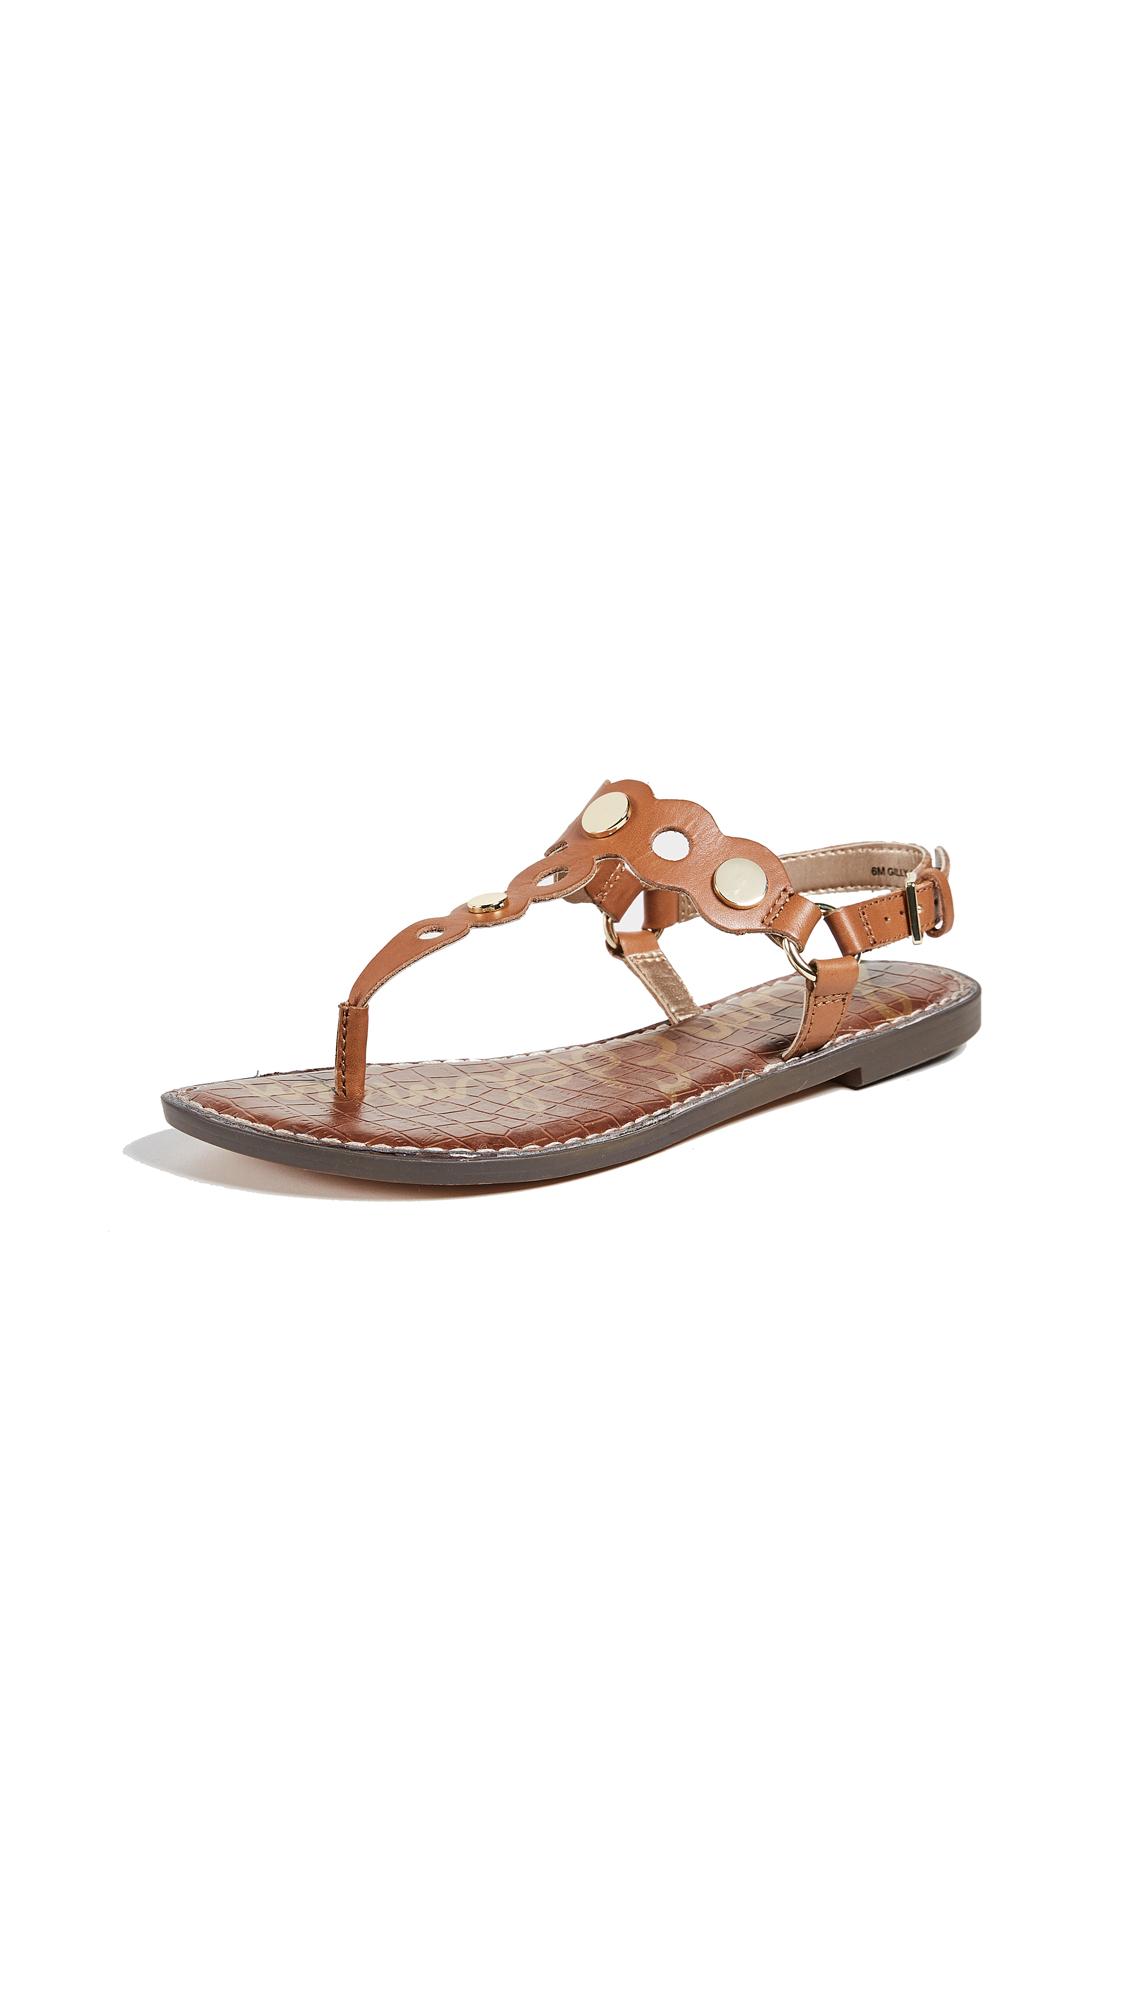 Sam Edelman Gilly Flat Sandals - Saddle